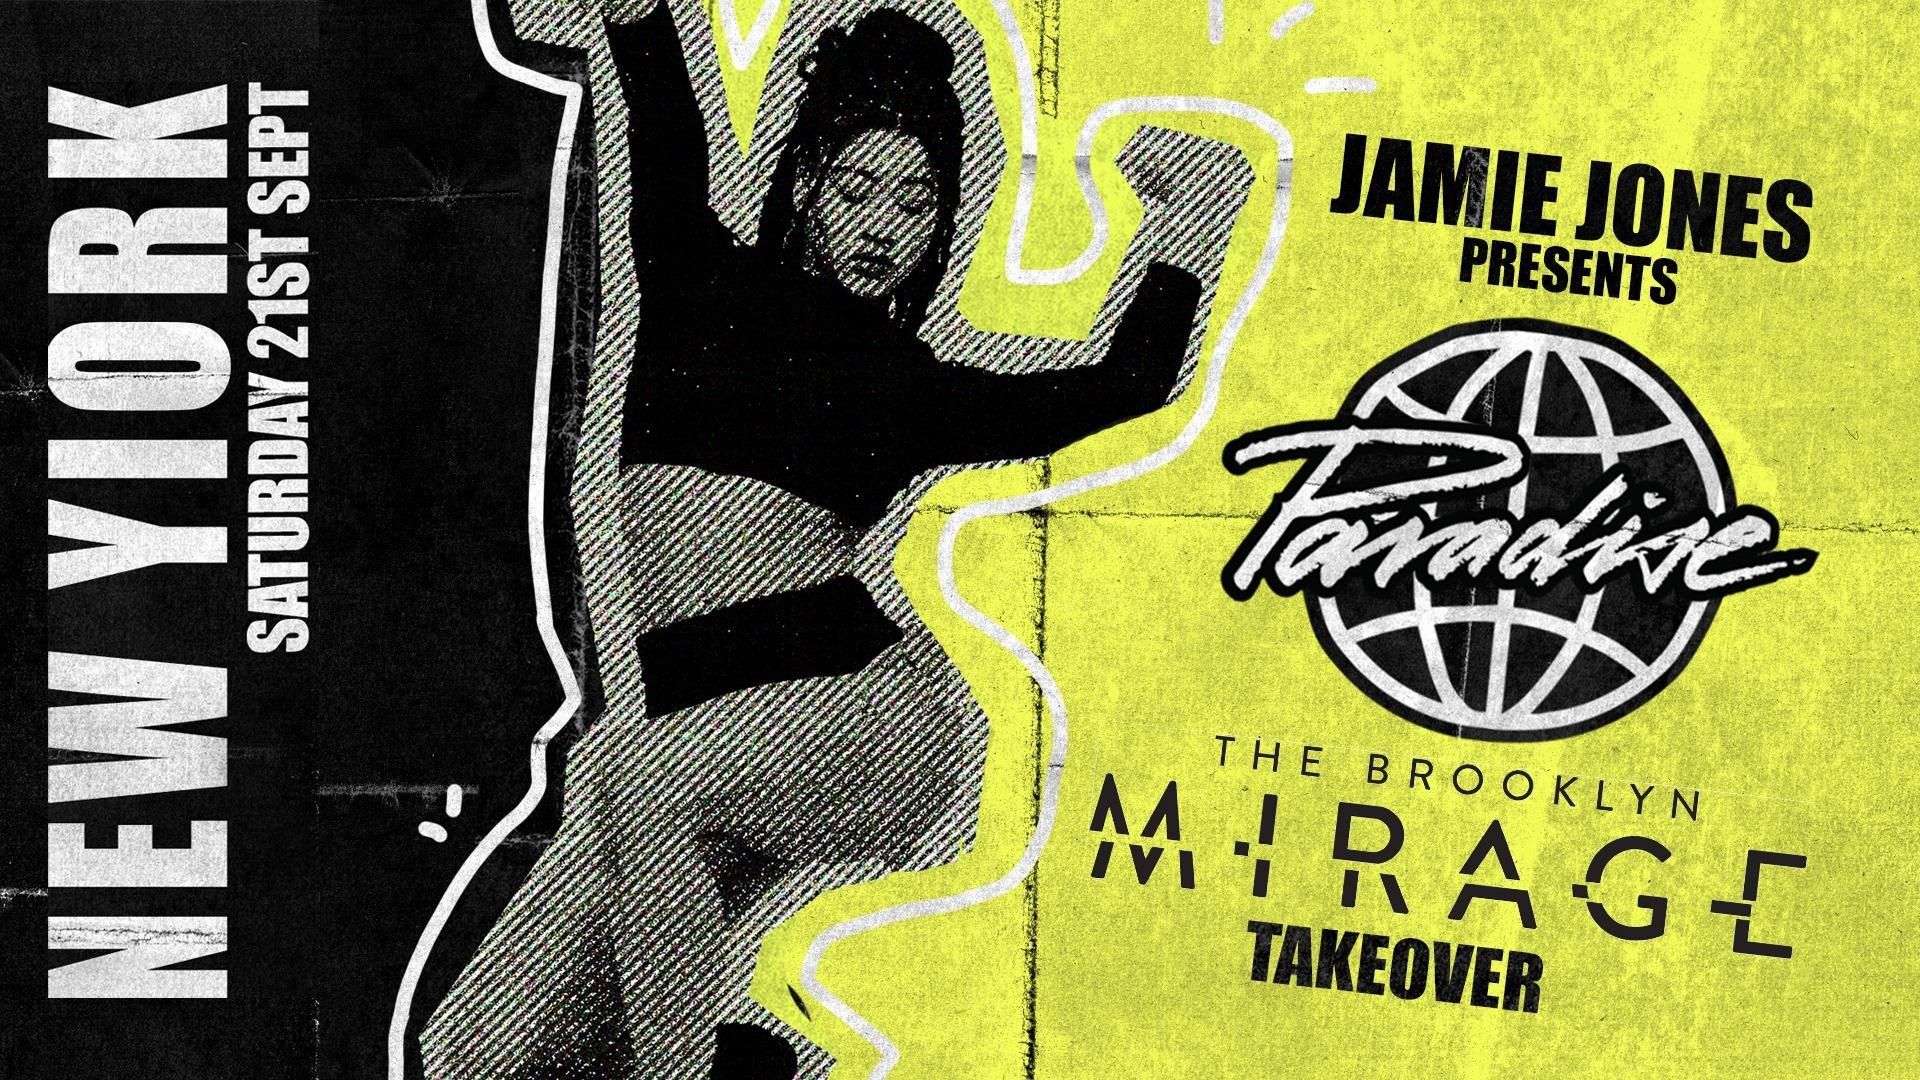 The brooklyn mirage avant gardner robbie lumpkin promotions paradise jamie jones